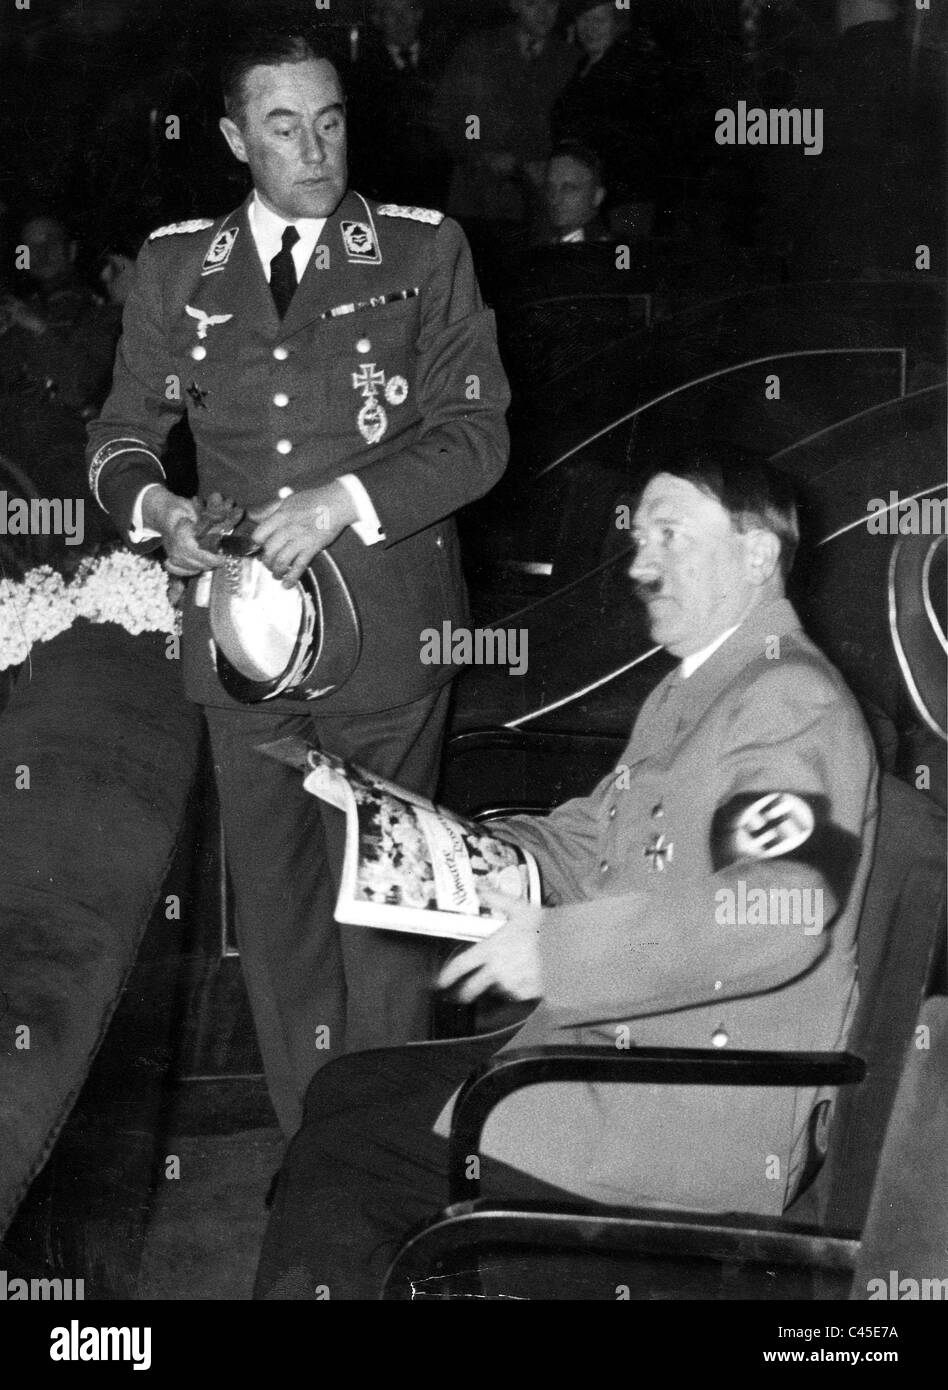 Adolf Hitler Theater/Movie - Stock Image